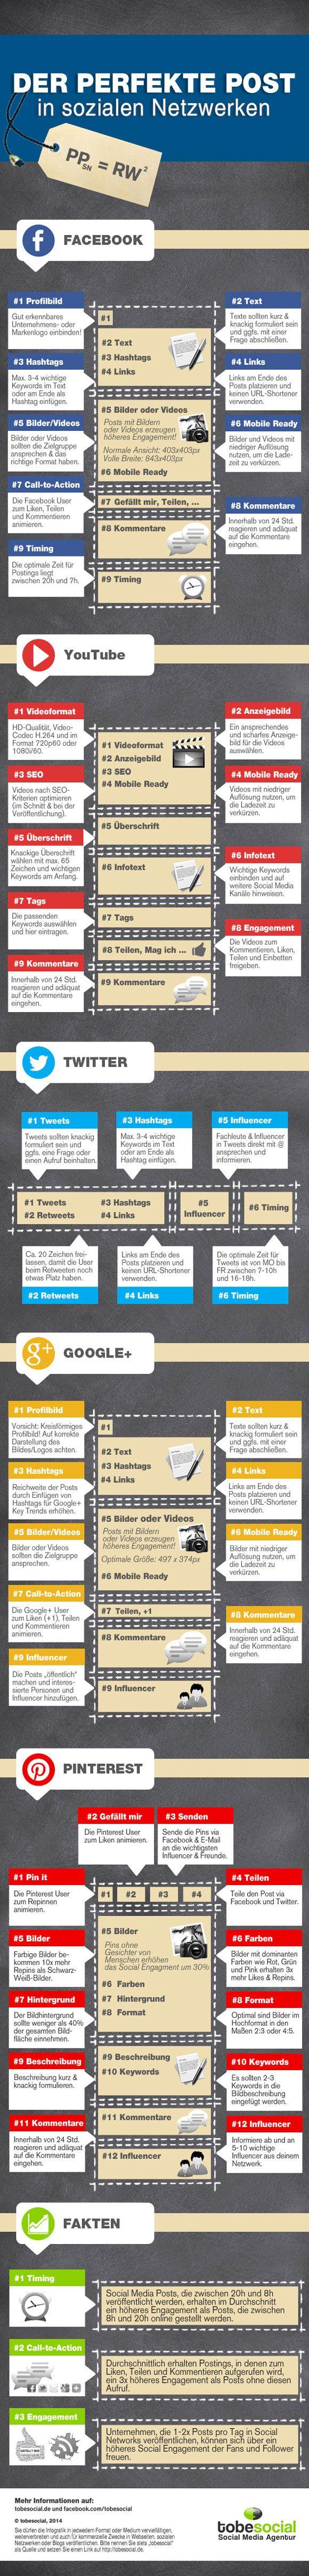 Aha ;-) So sieht er aus, der perfekte Post im Social Web via @deutsche-startups.de   #socialmedia #infographic